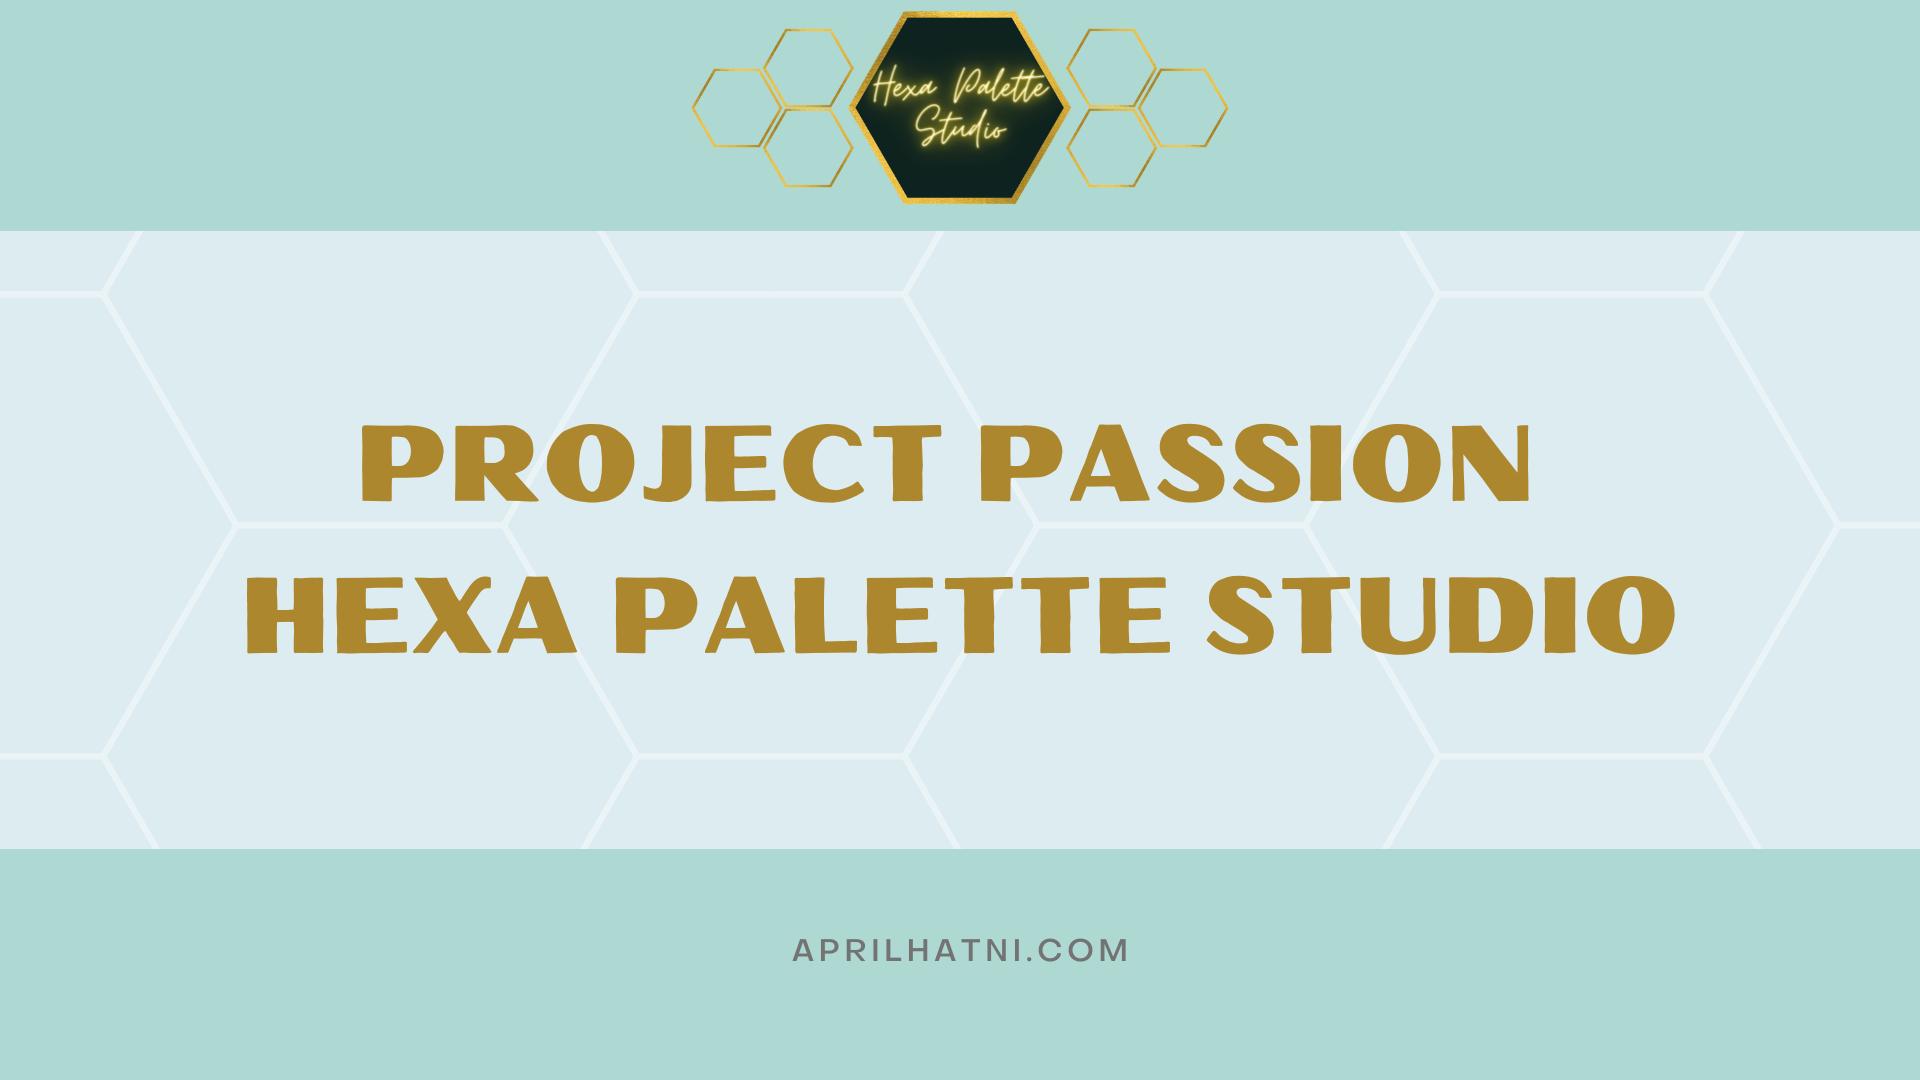 project passion hexa palette studio